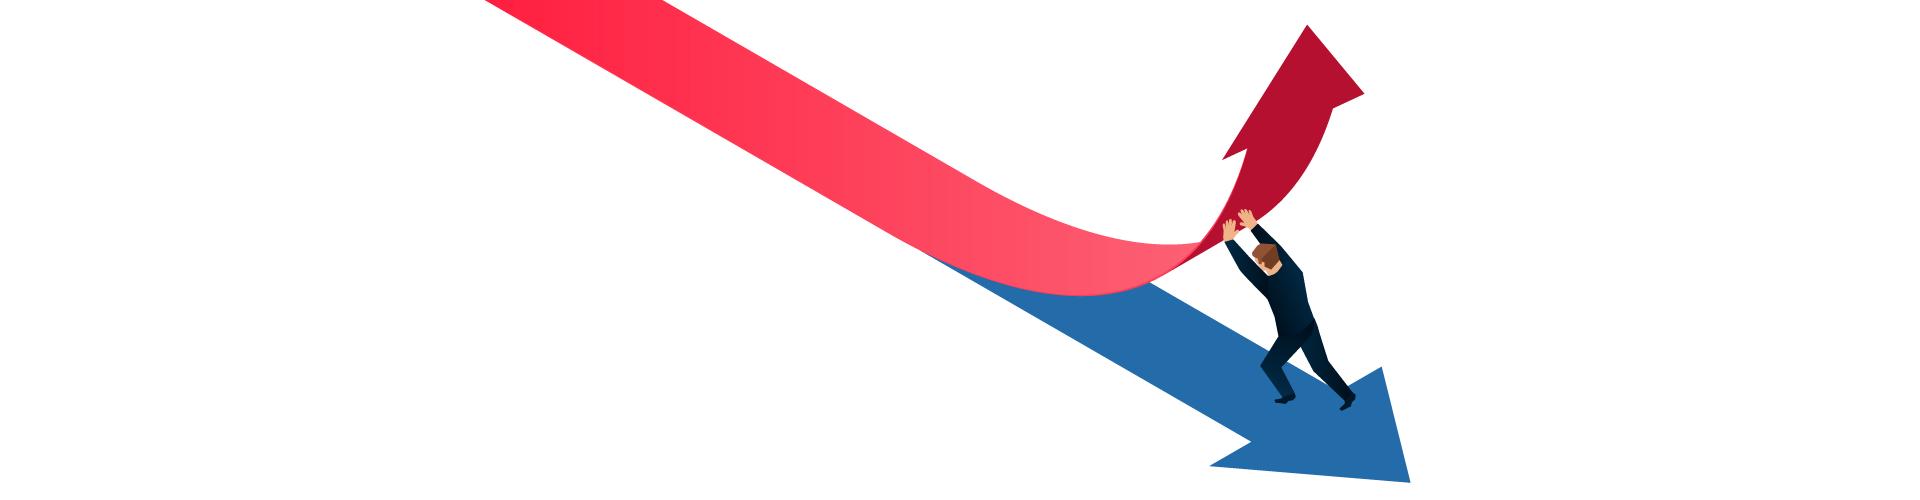 Illustration of man pushing red arrow